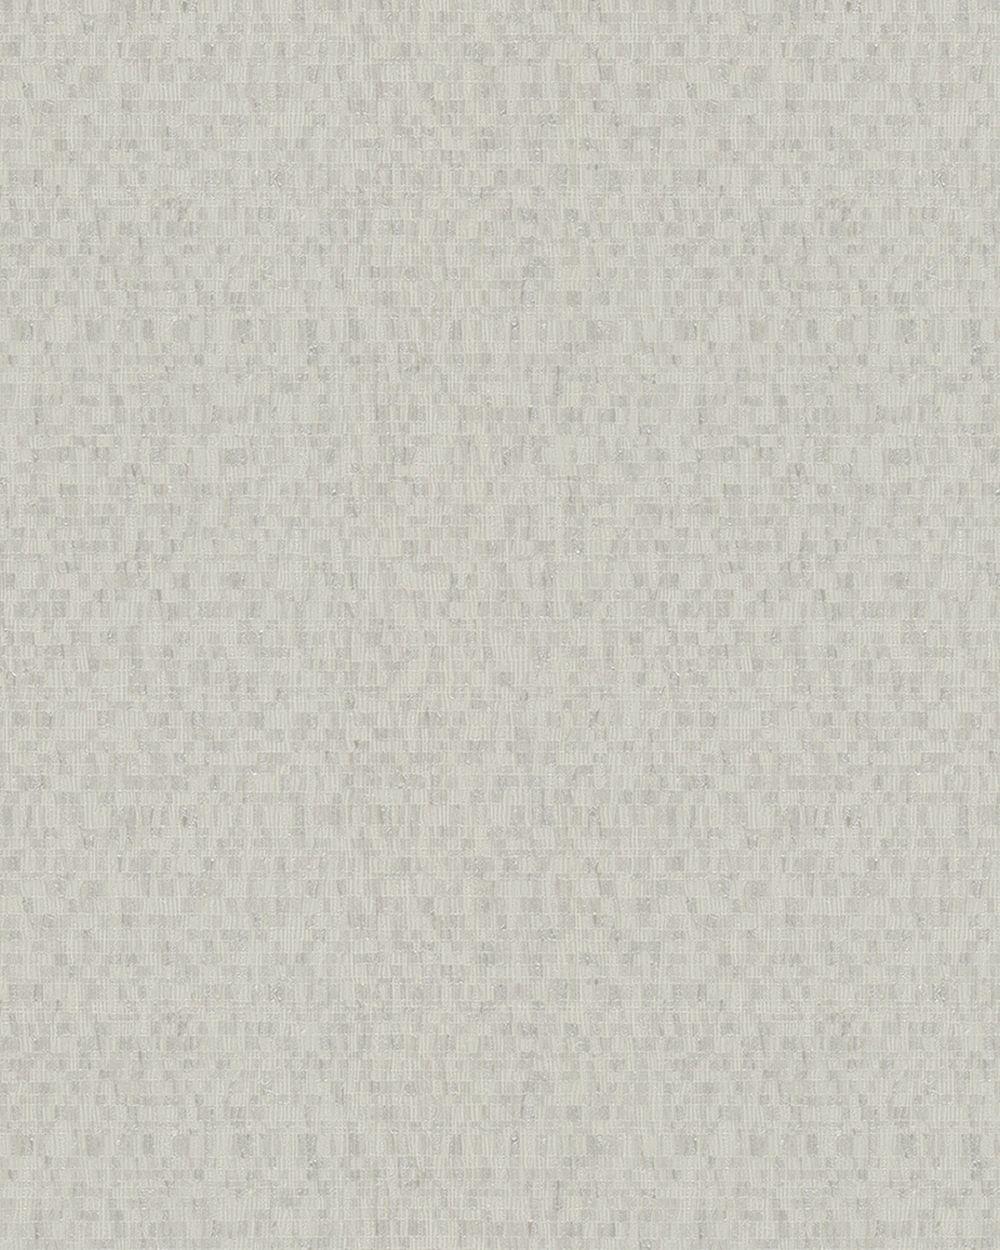 Vliestapete design muster beigegrau silber glanz marburg 59349 for Vliestapete muster